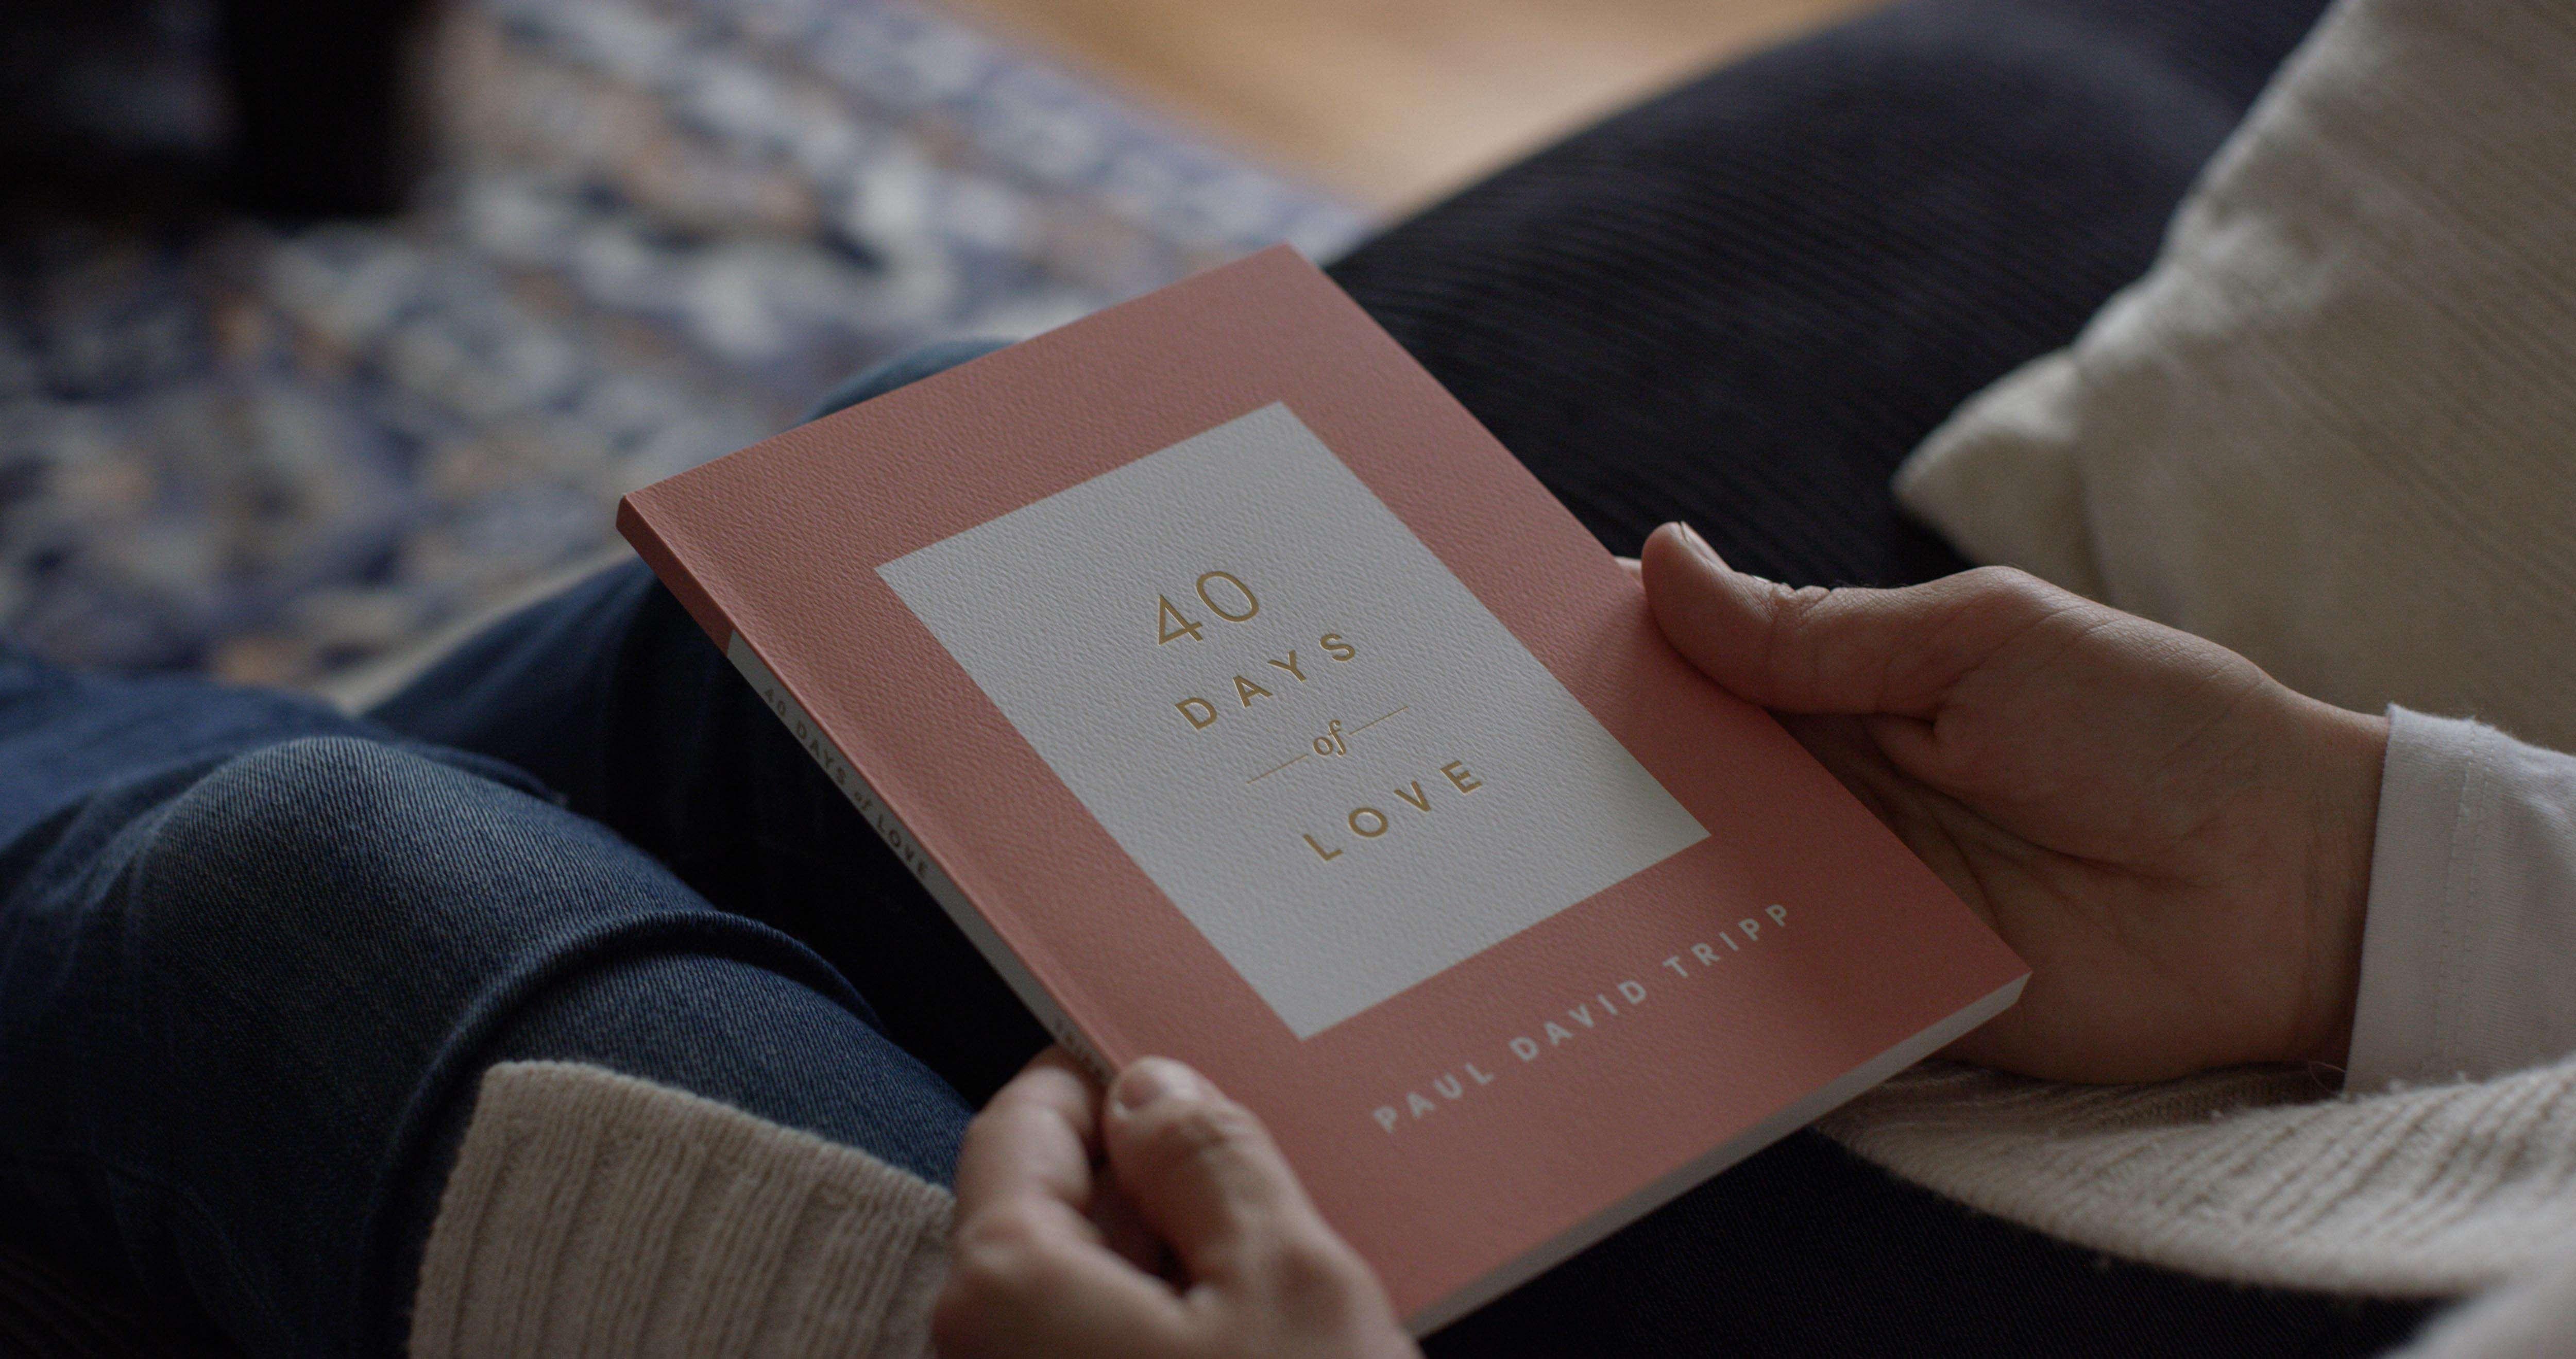 '40 Days of Love' by Paul David Tripp